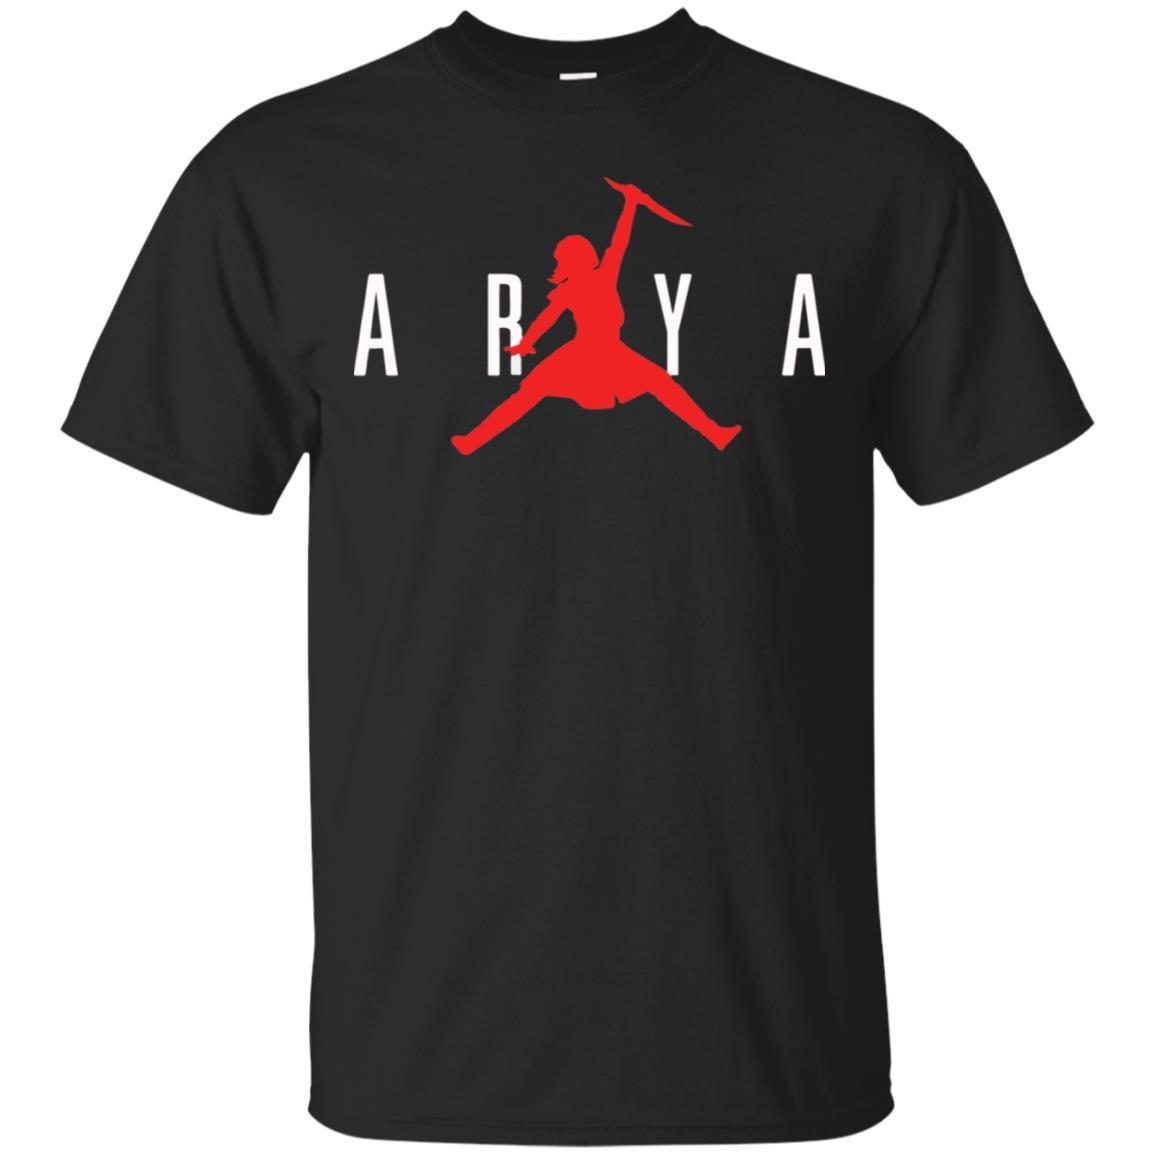 Distinción Amigo planes  Arya Stark Air Jordan shirt, hoodie, long sleeve